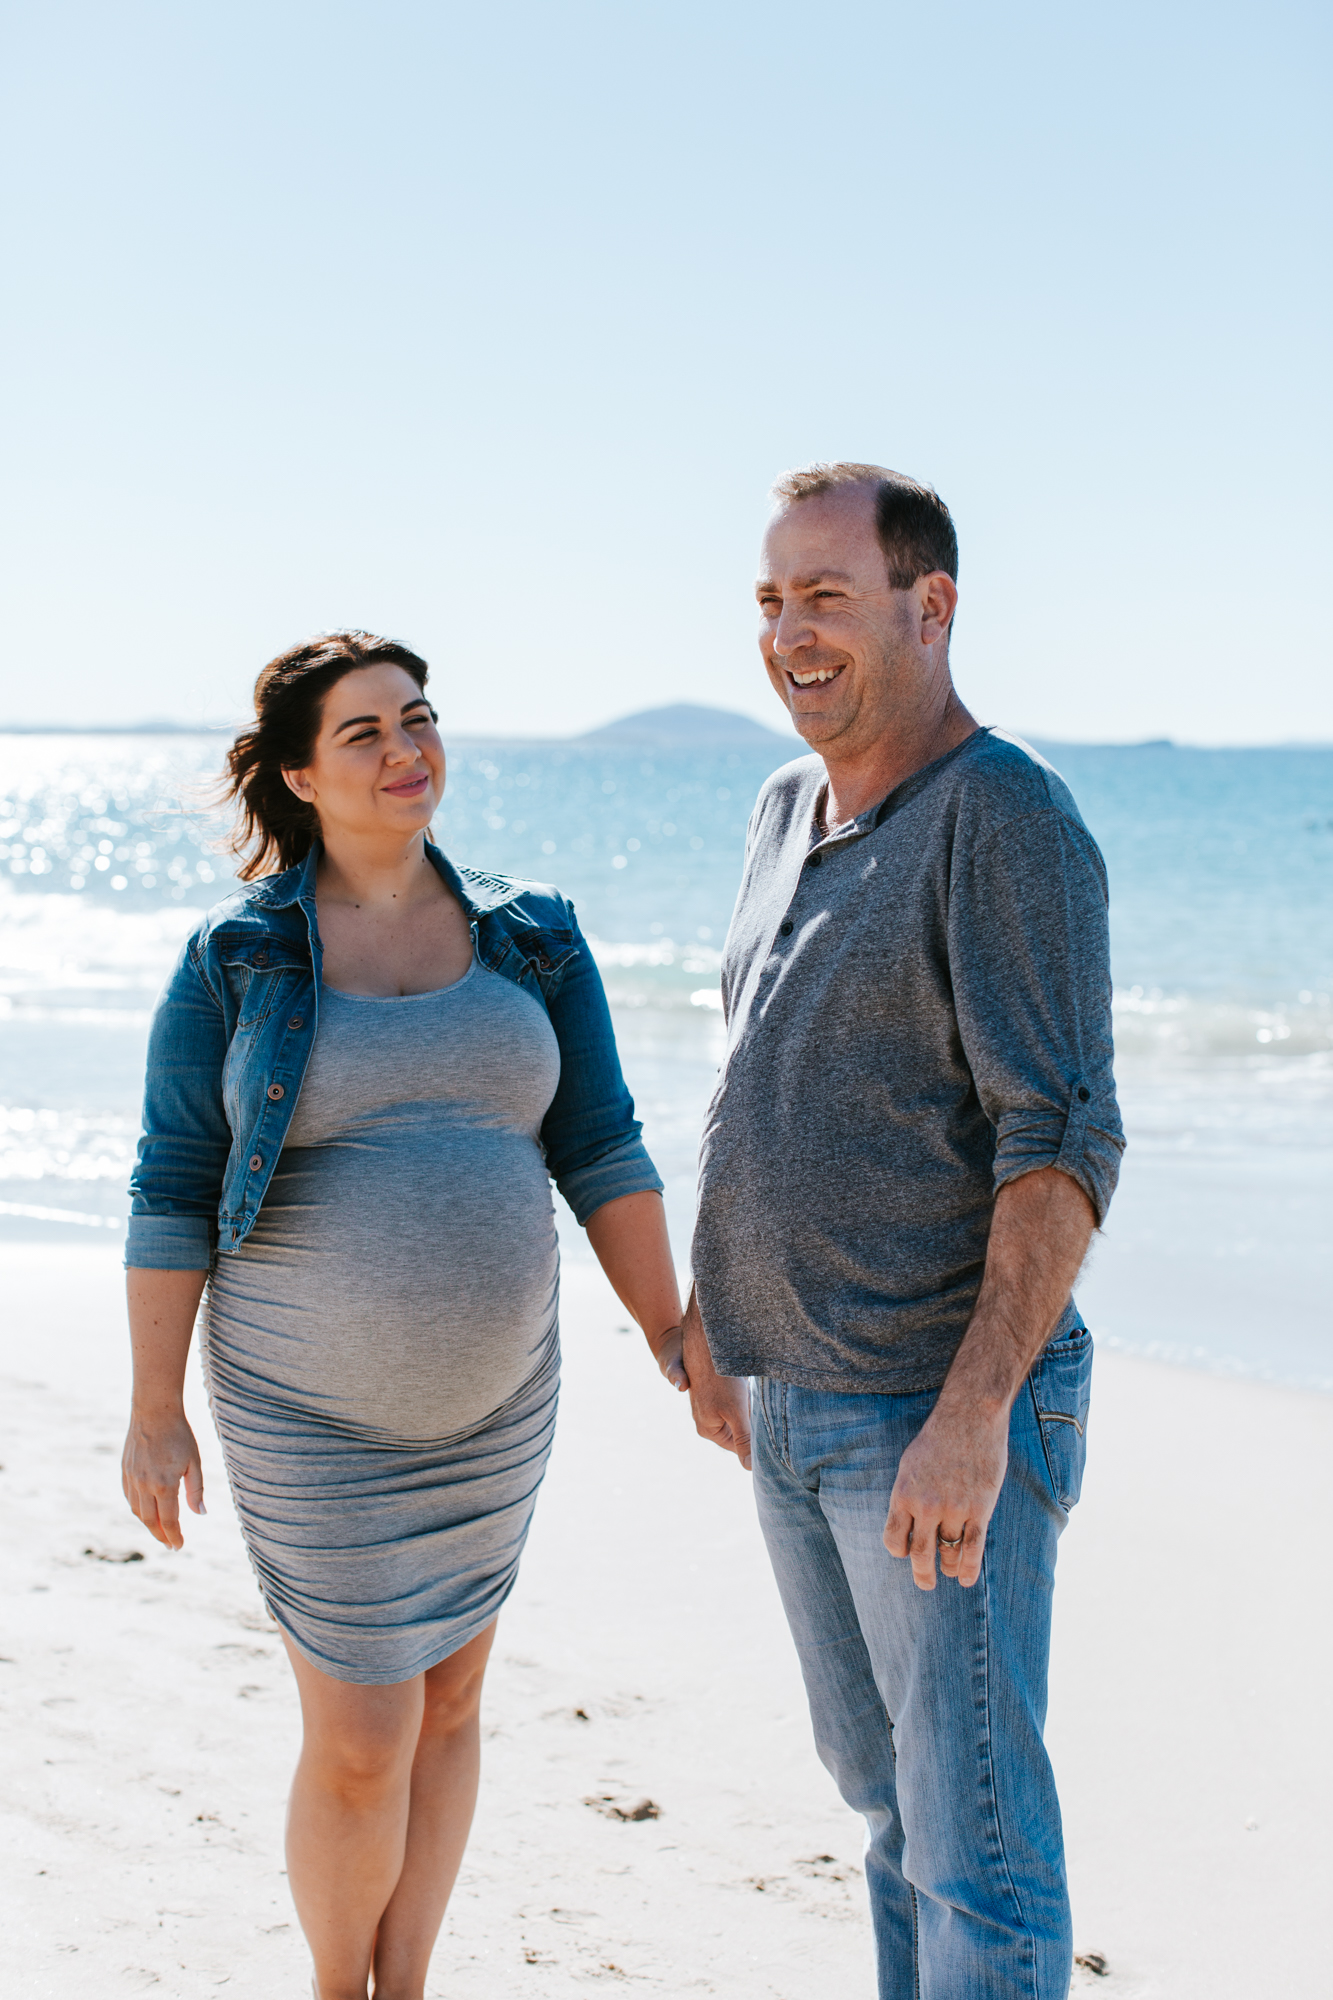 Brisbane maternity photographer kym renay.rach.mat 019.jpg